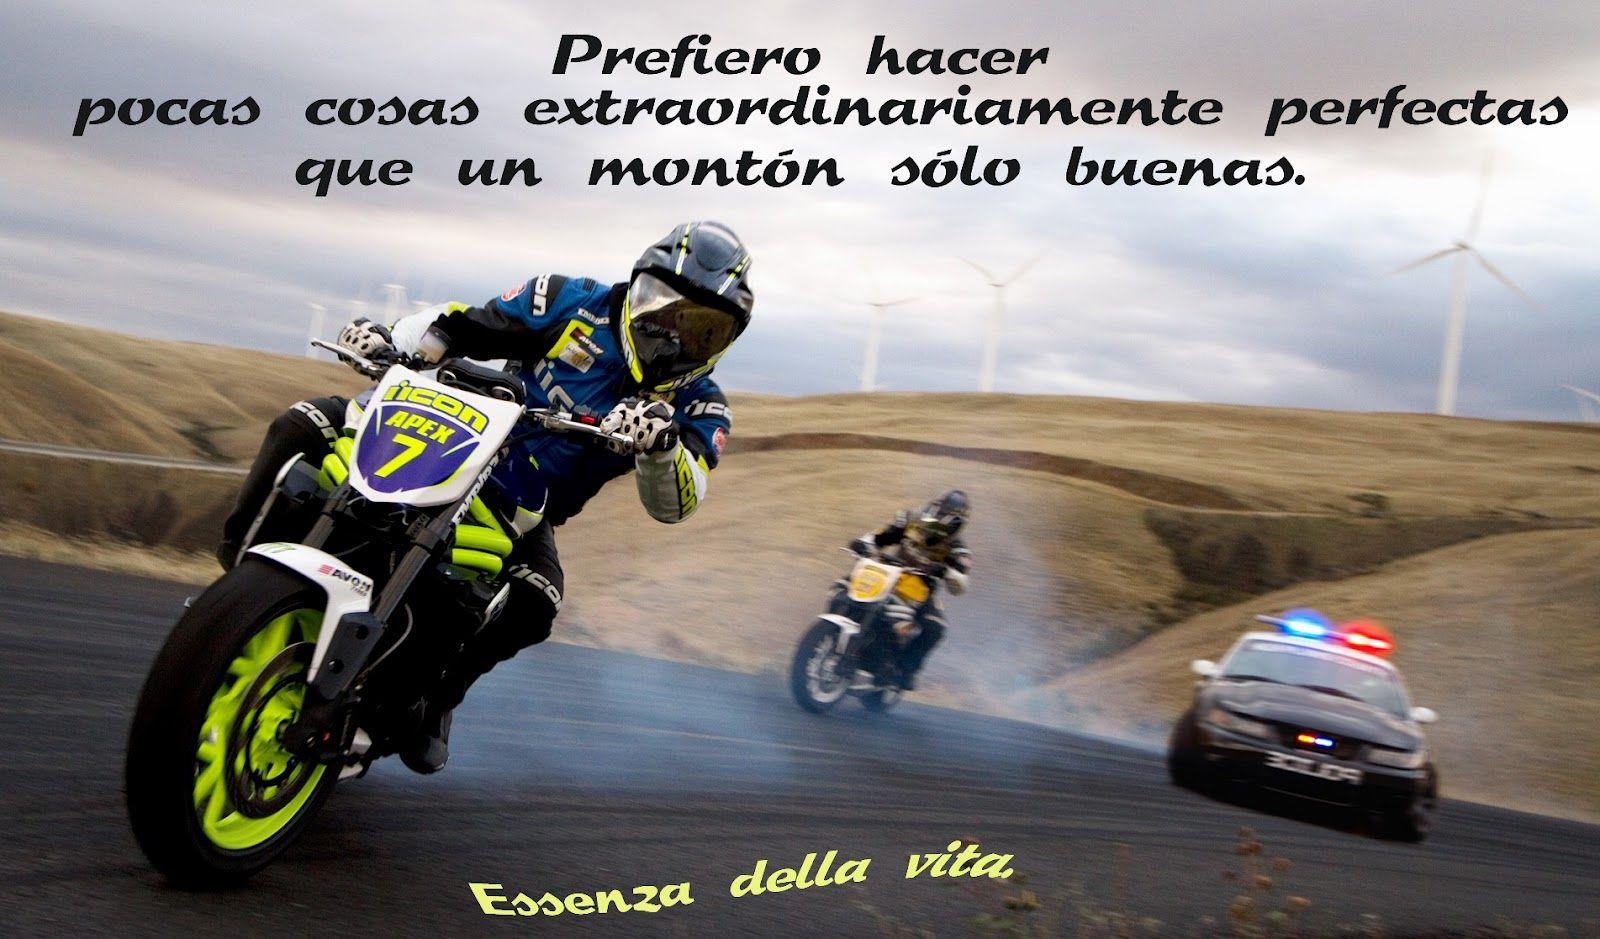 Imagenes De Motos Con Frases De Amor Link Afiliacion Amazon Motos